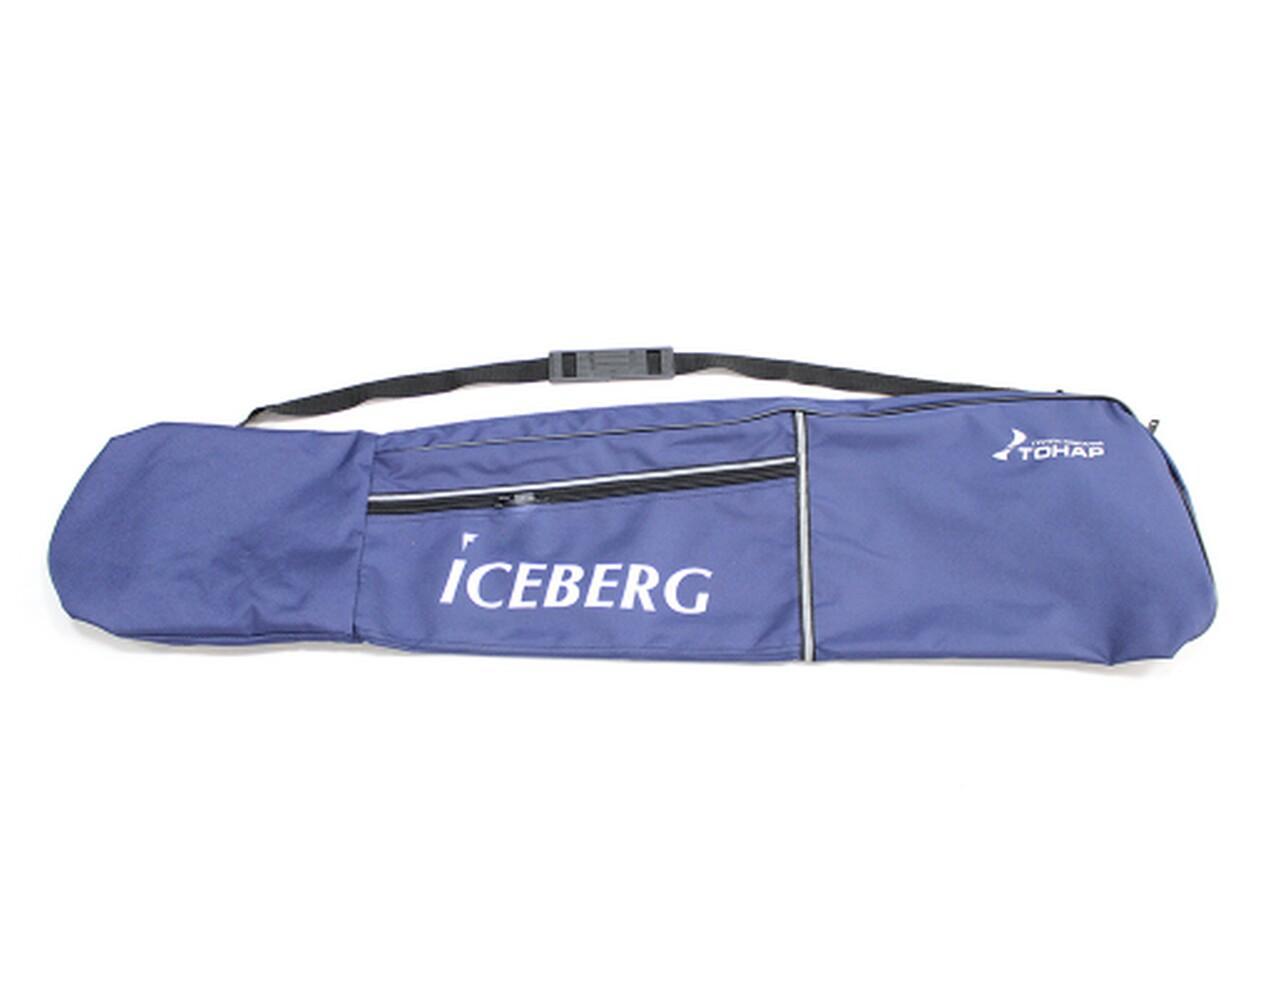 Чехол для ледобура ICEBERG ф130 (ТОНАР)